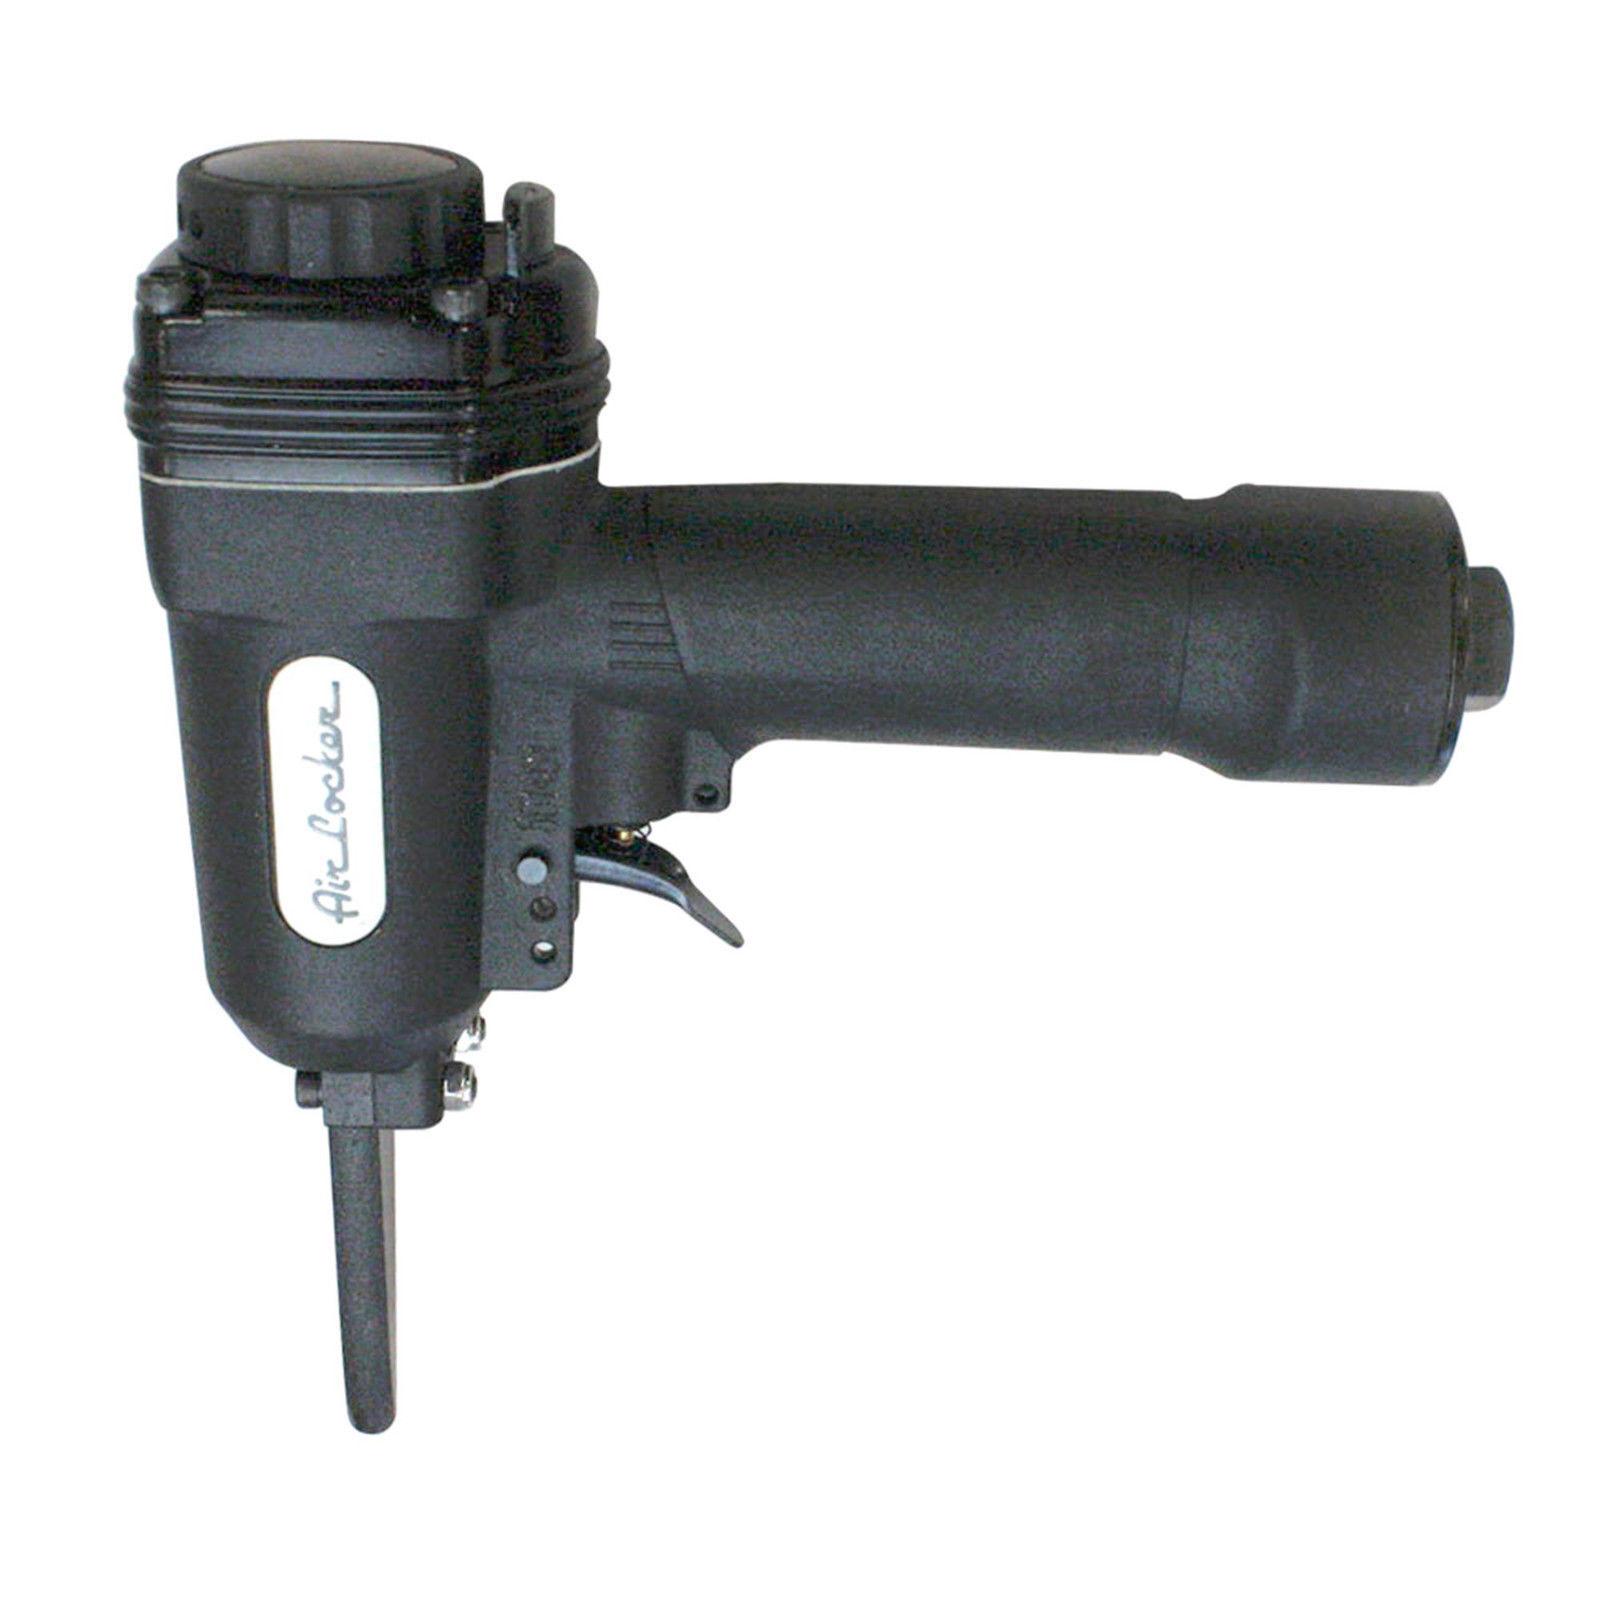 Heavy Duty Pneumatic Professional Punch Nailer / Nail Remove